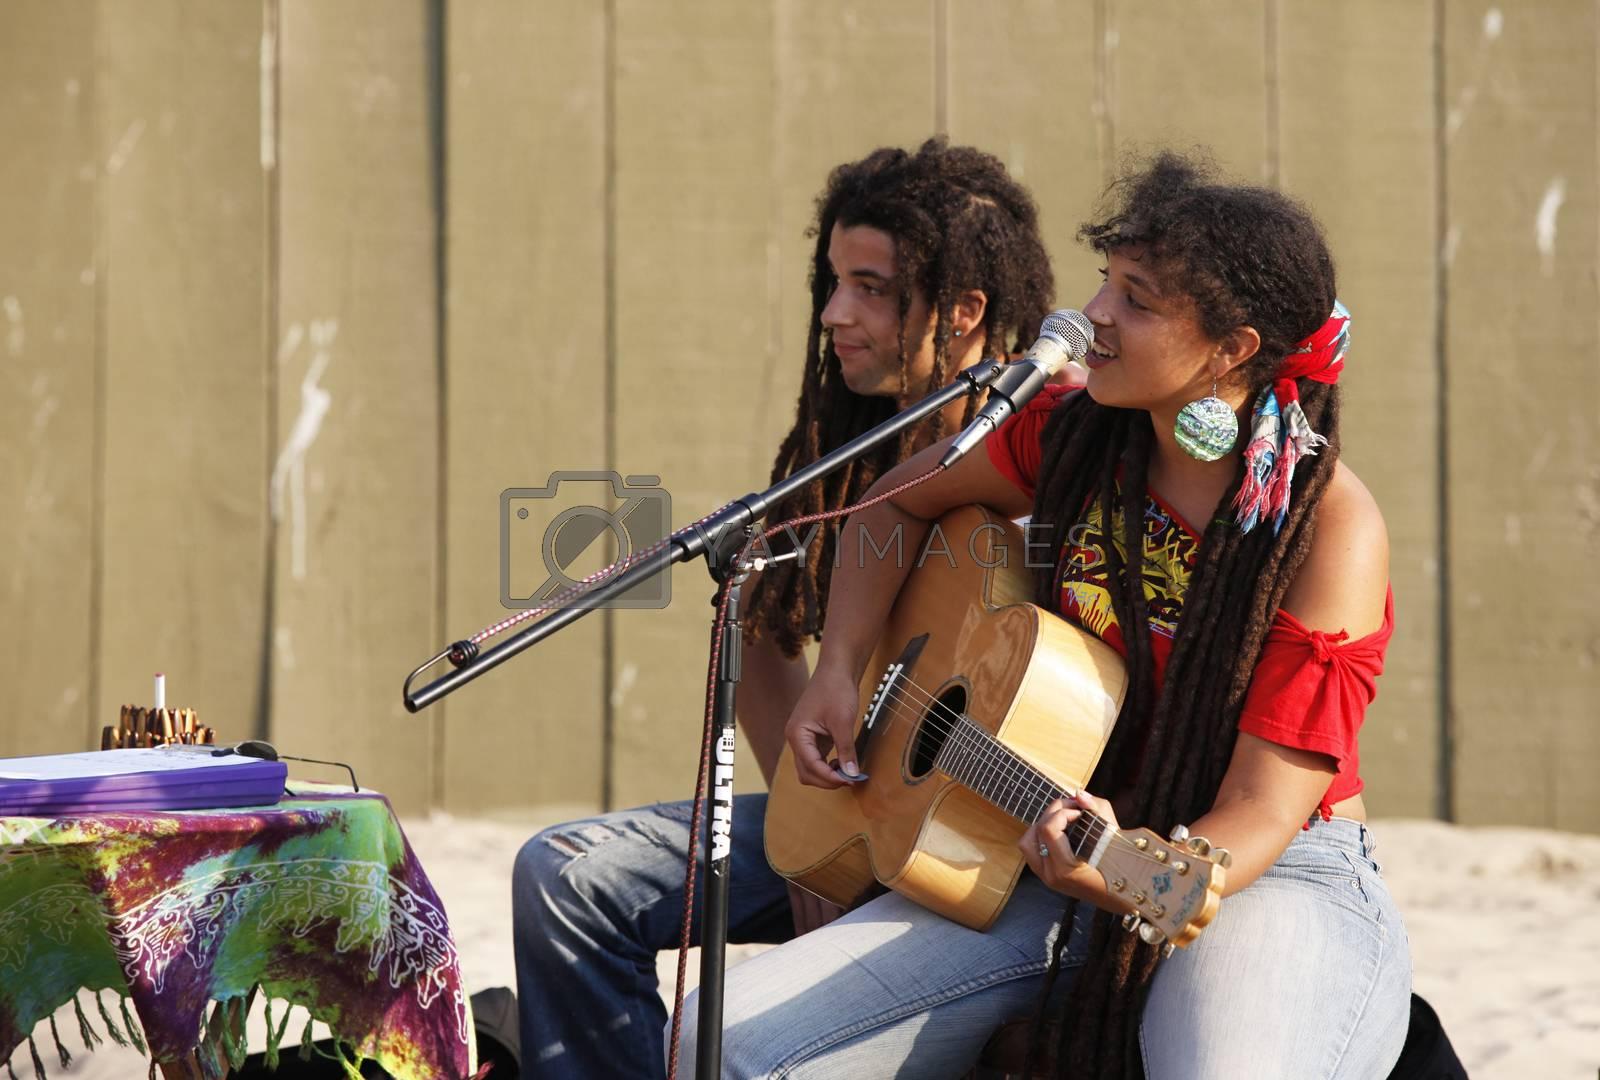 Santa Monica, CA, USA - September 18, 2011: Naia Kete with his musicians use the Santa Monica beach as the backdrop to to present their song